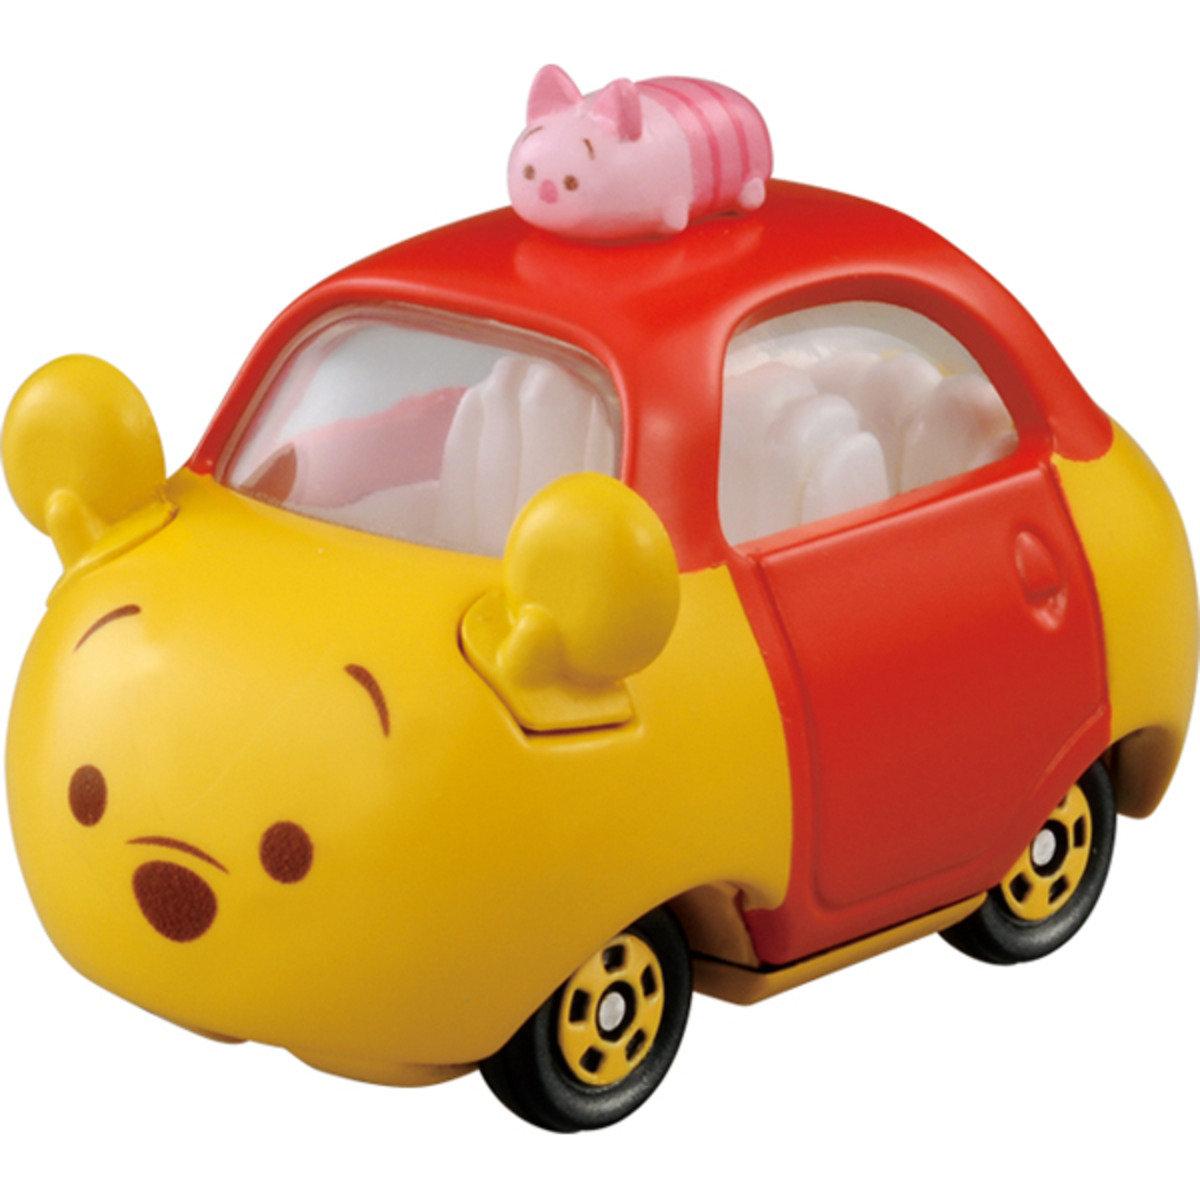 DMT-05 Disney Tsum Tsum Winnie the Pooh Tsum Top